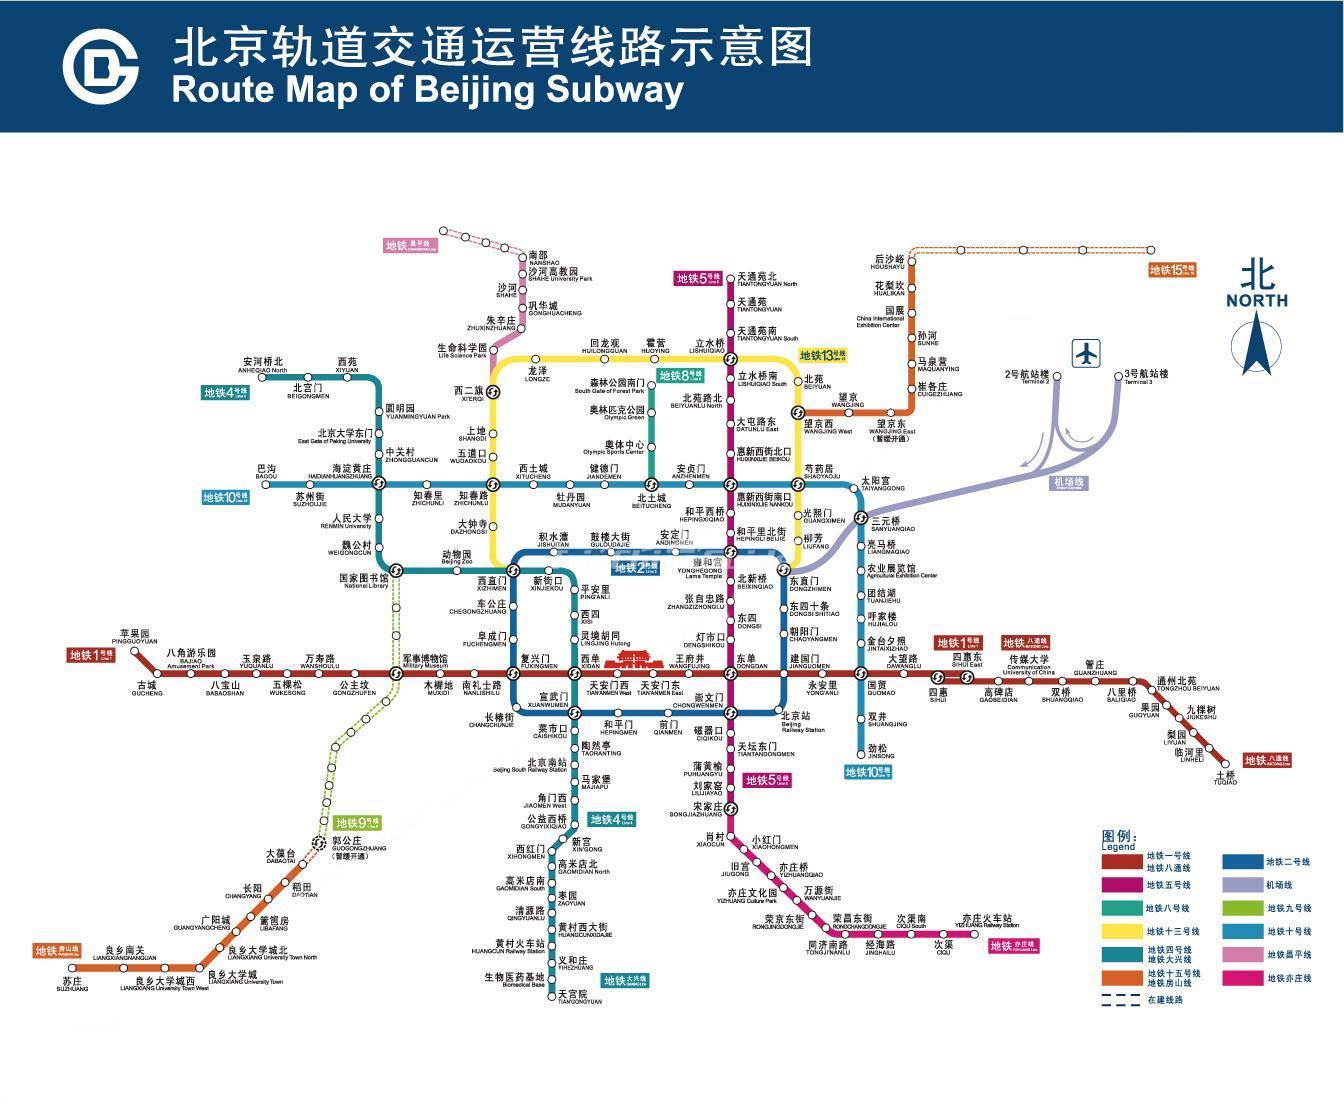 Suzhou Subway Map.Beijing Subway Map 4 Maps Of Beijing